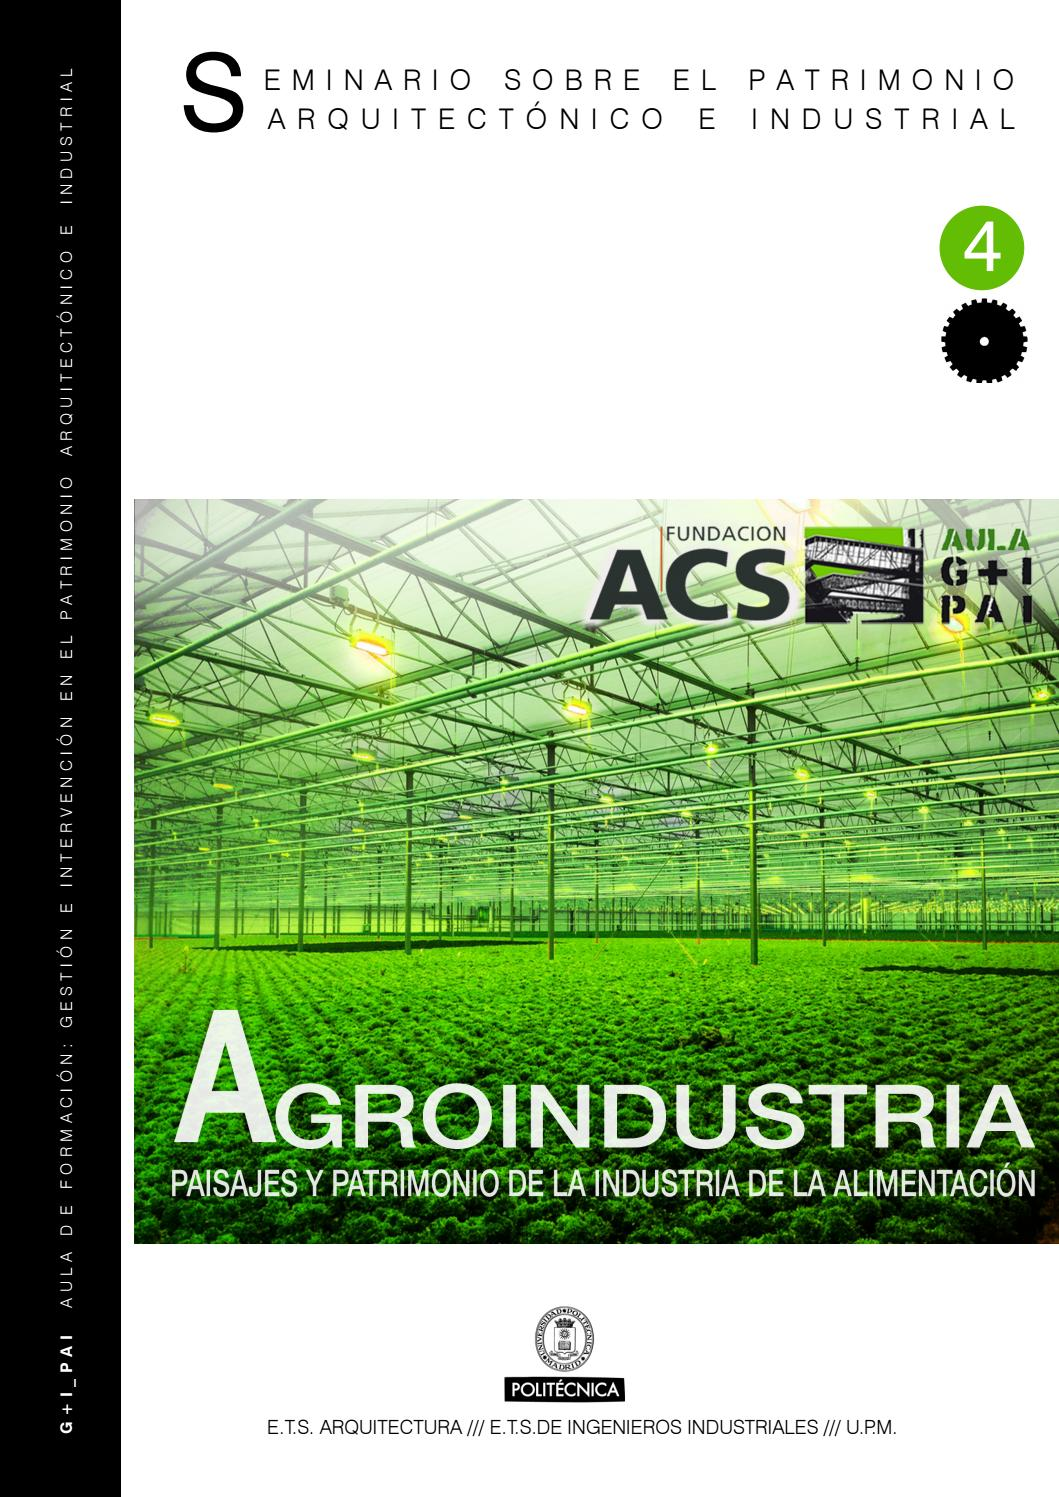 60e02fb21c Actas del IV Seminario Agroindustria by Aula G+I_PAI - issuu